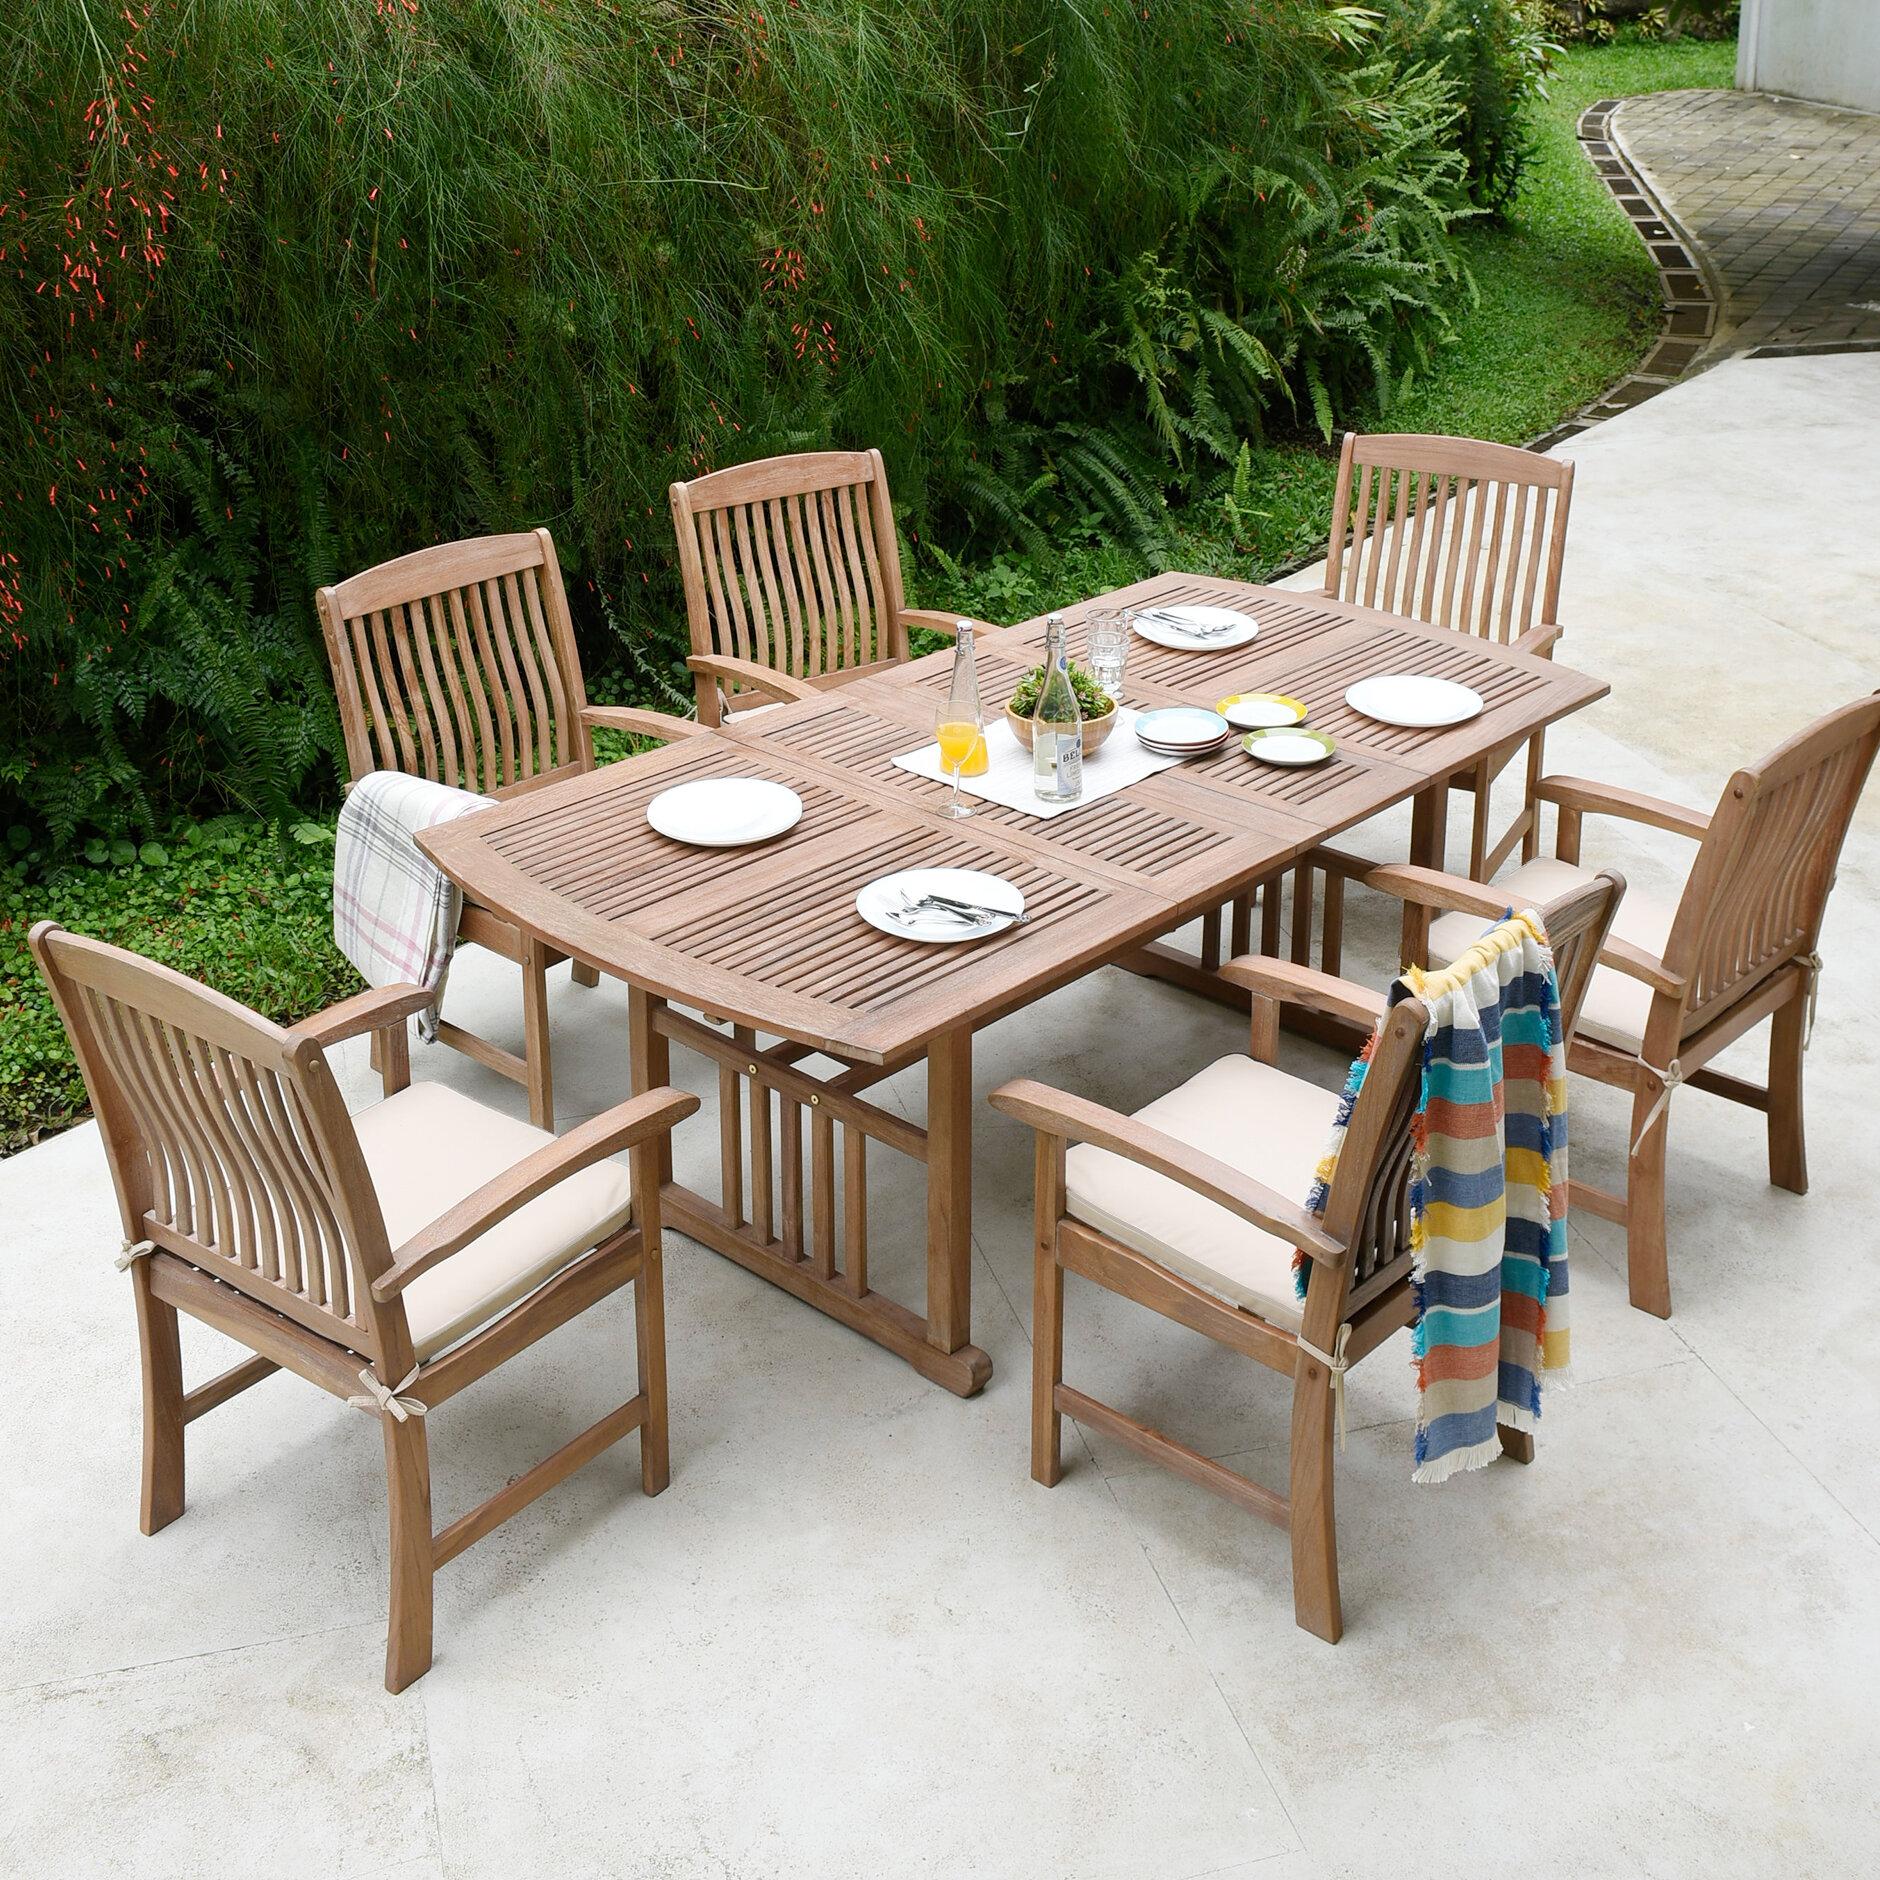 Gracie Oaks Corpuz 7 Piece Teak Dining Set With Cushions Reviews Wayfair